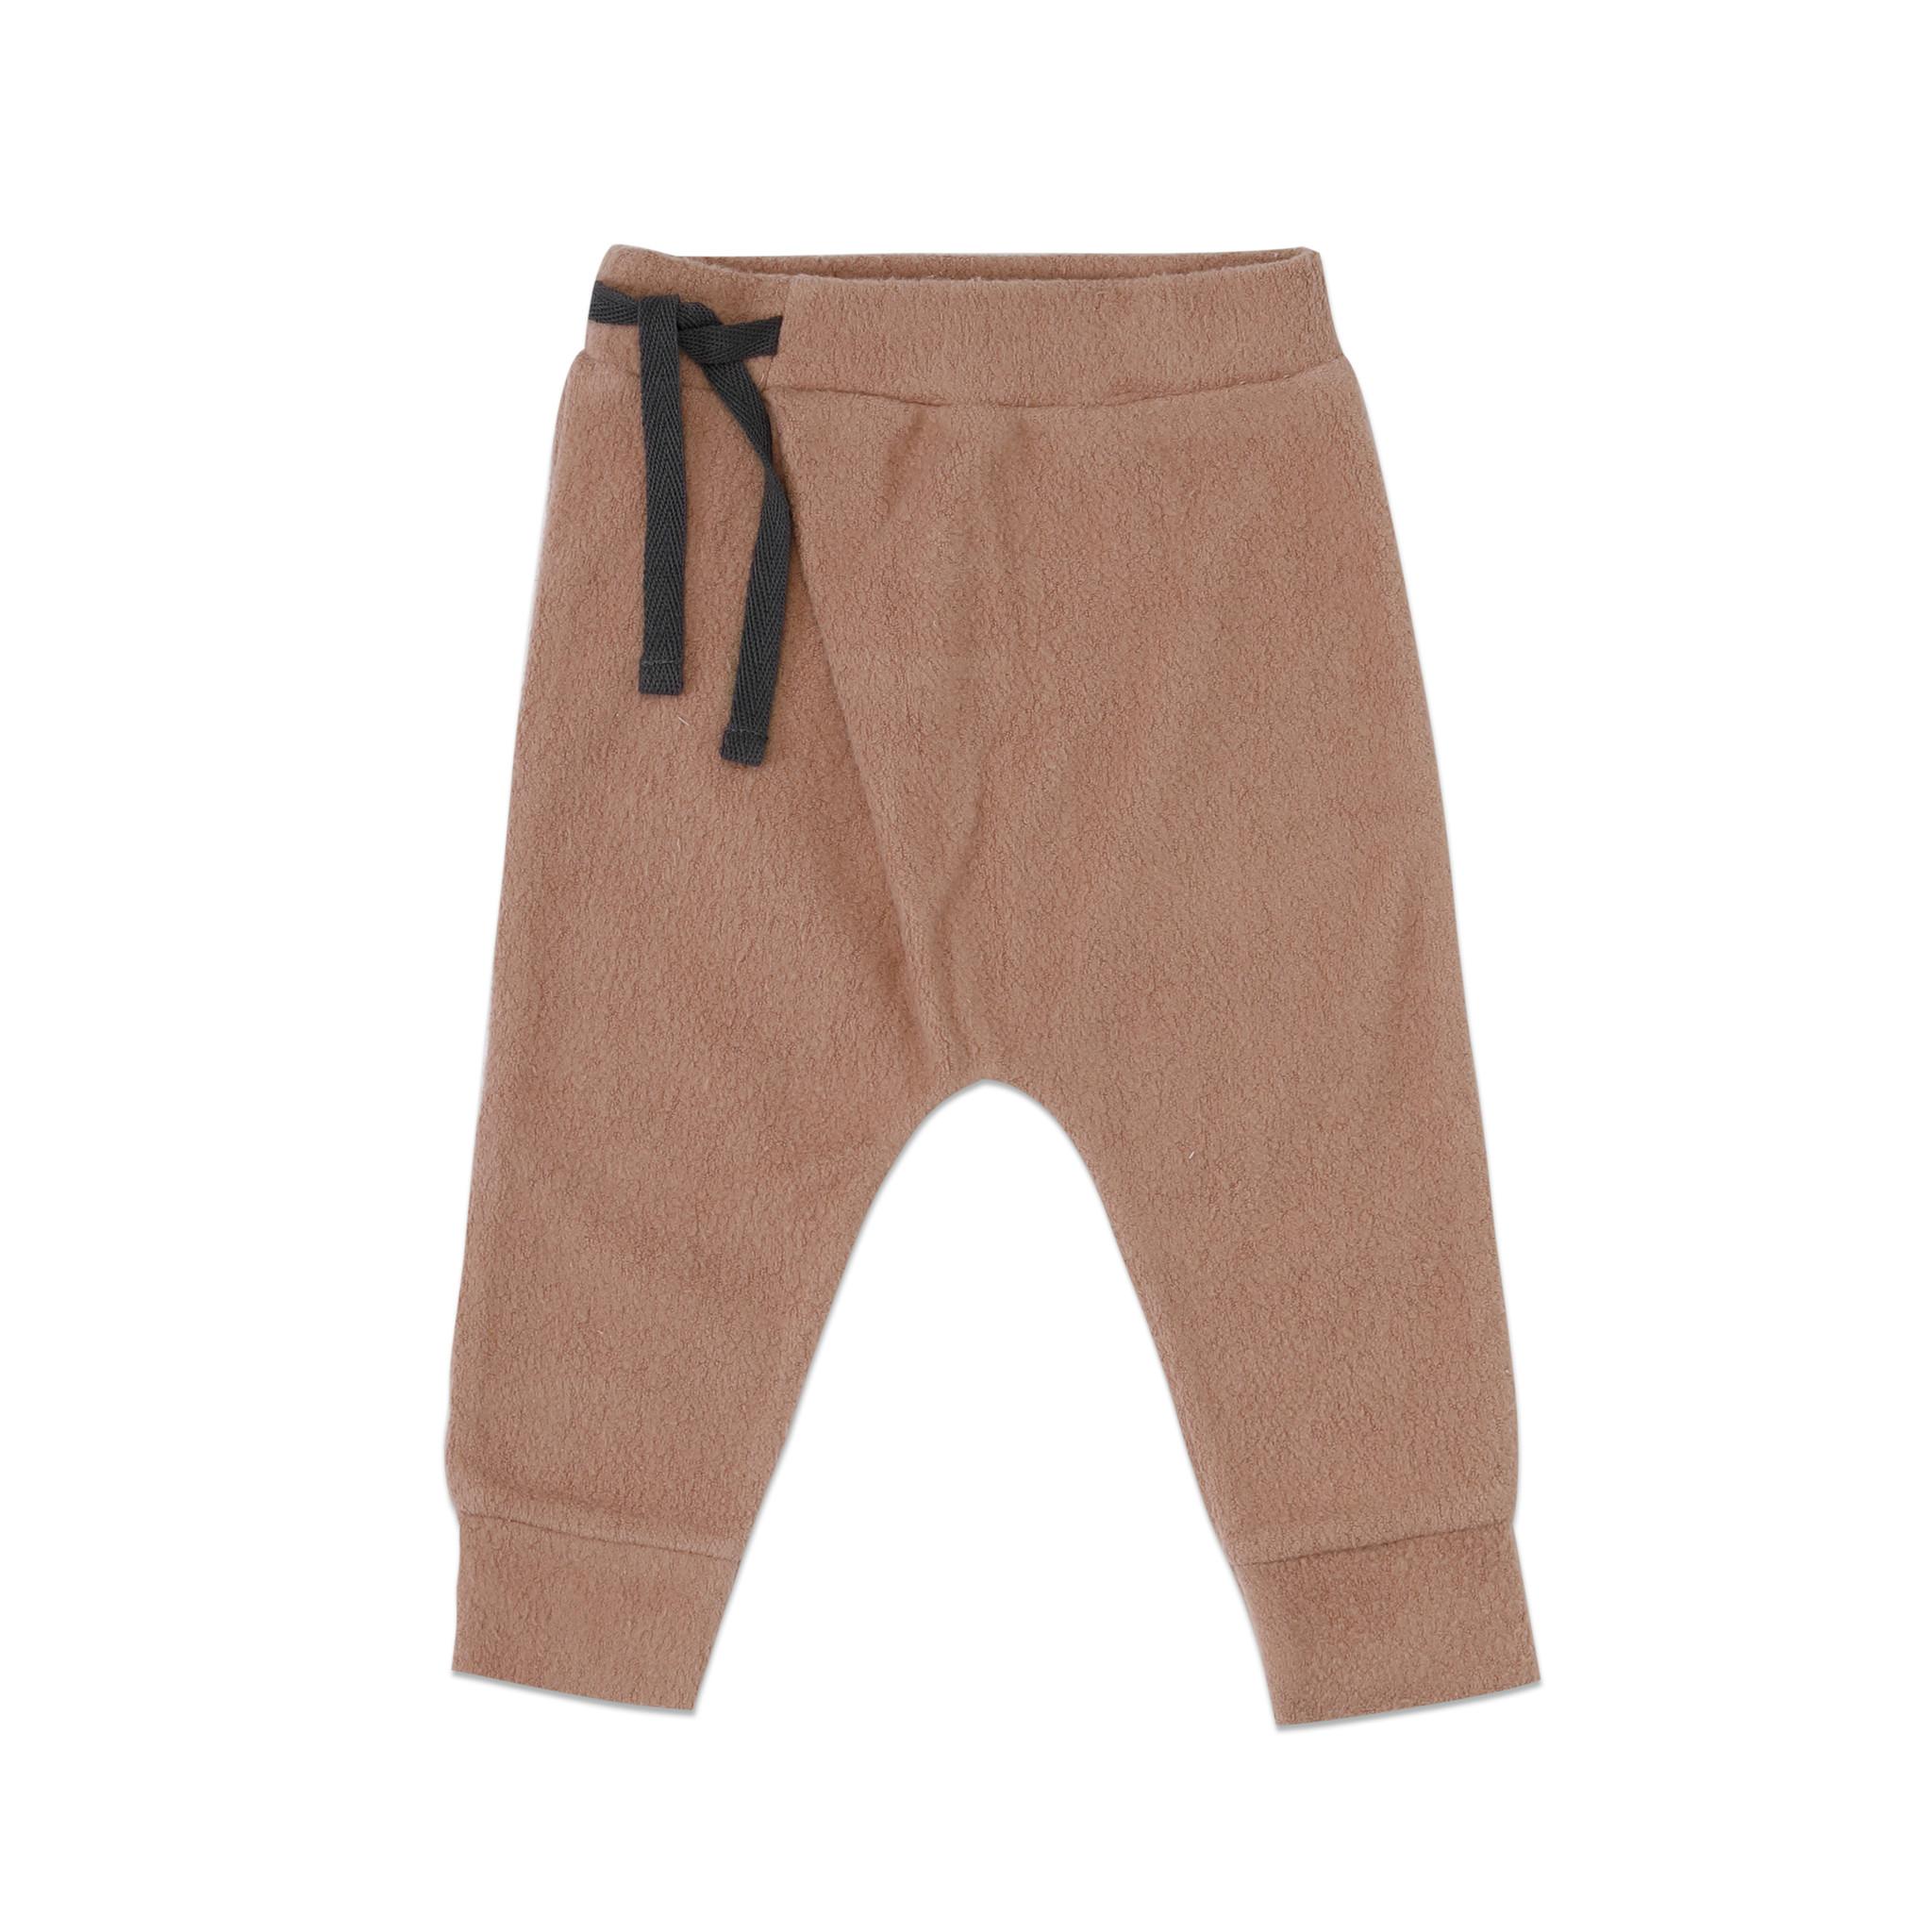 Teddy baby harem pants - creamy mocha-1